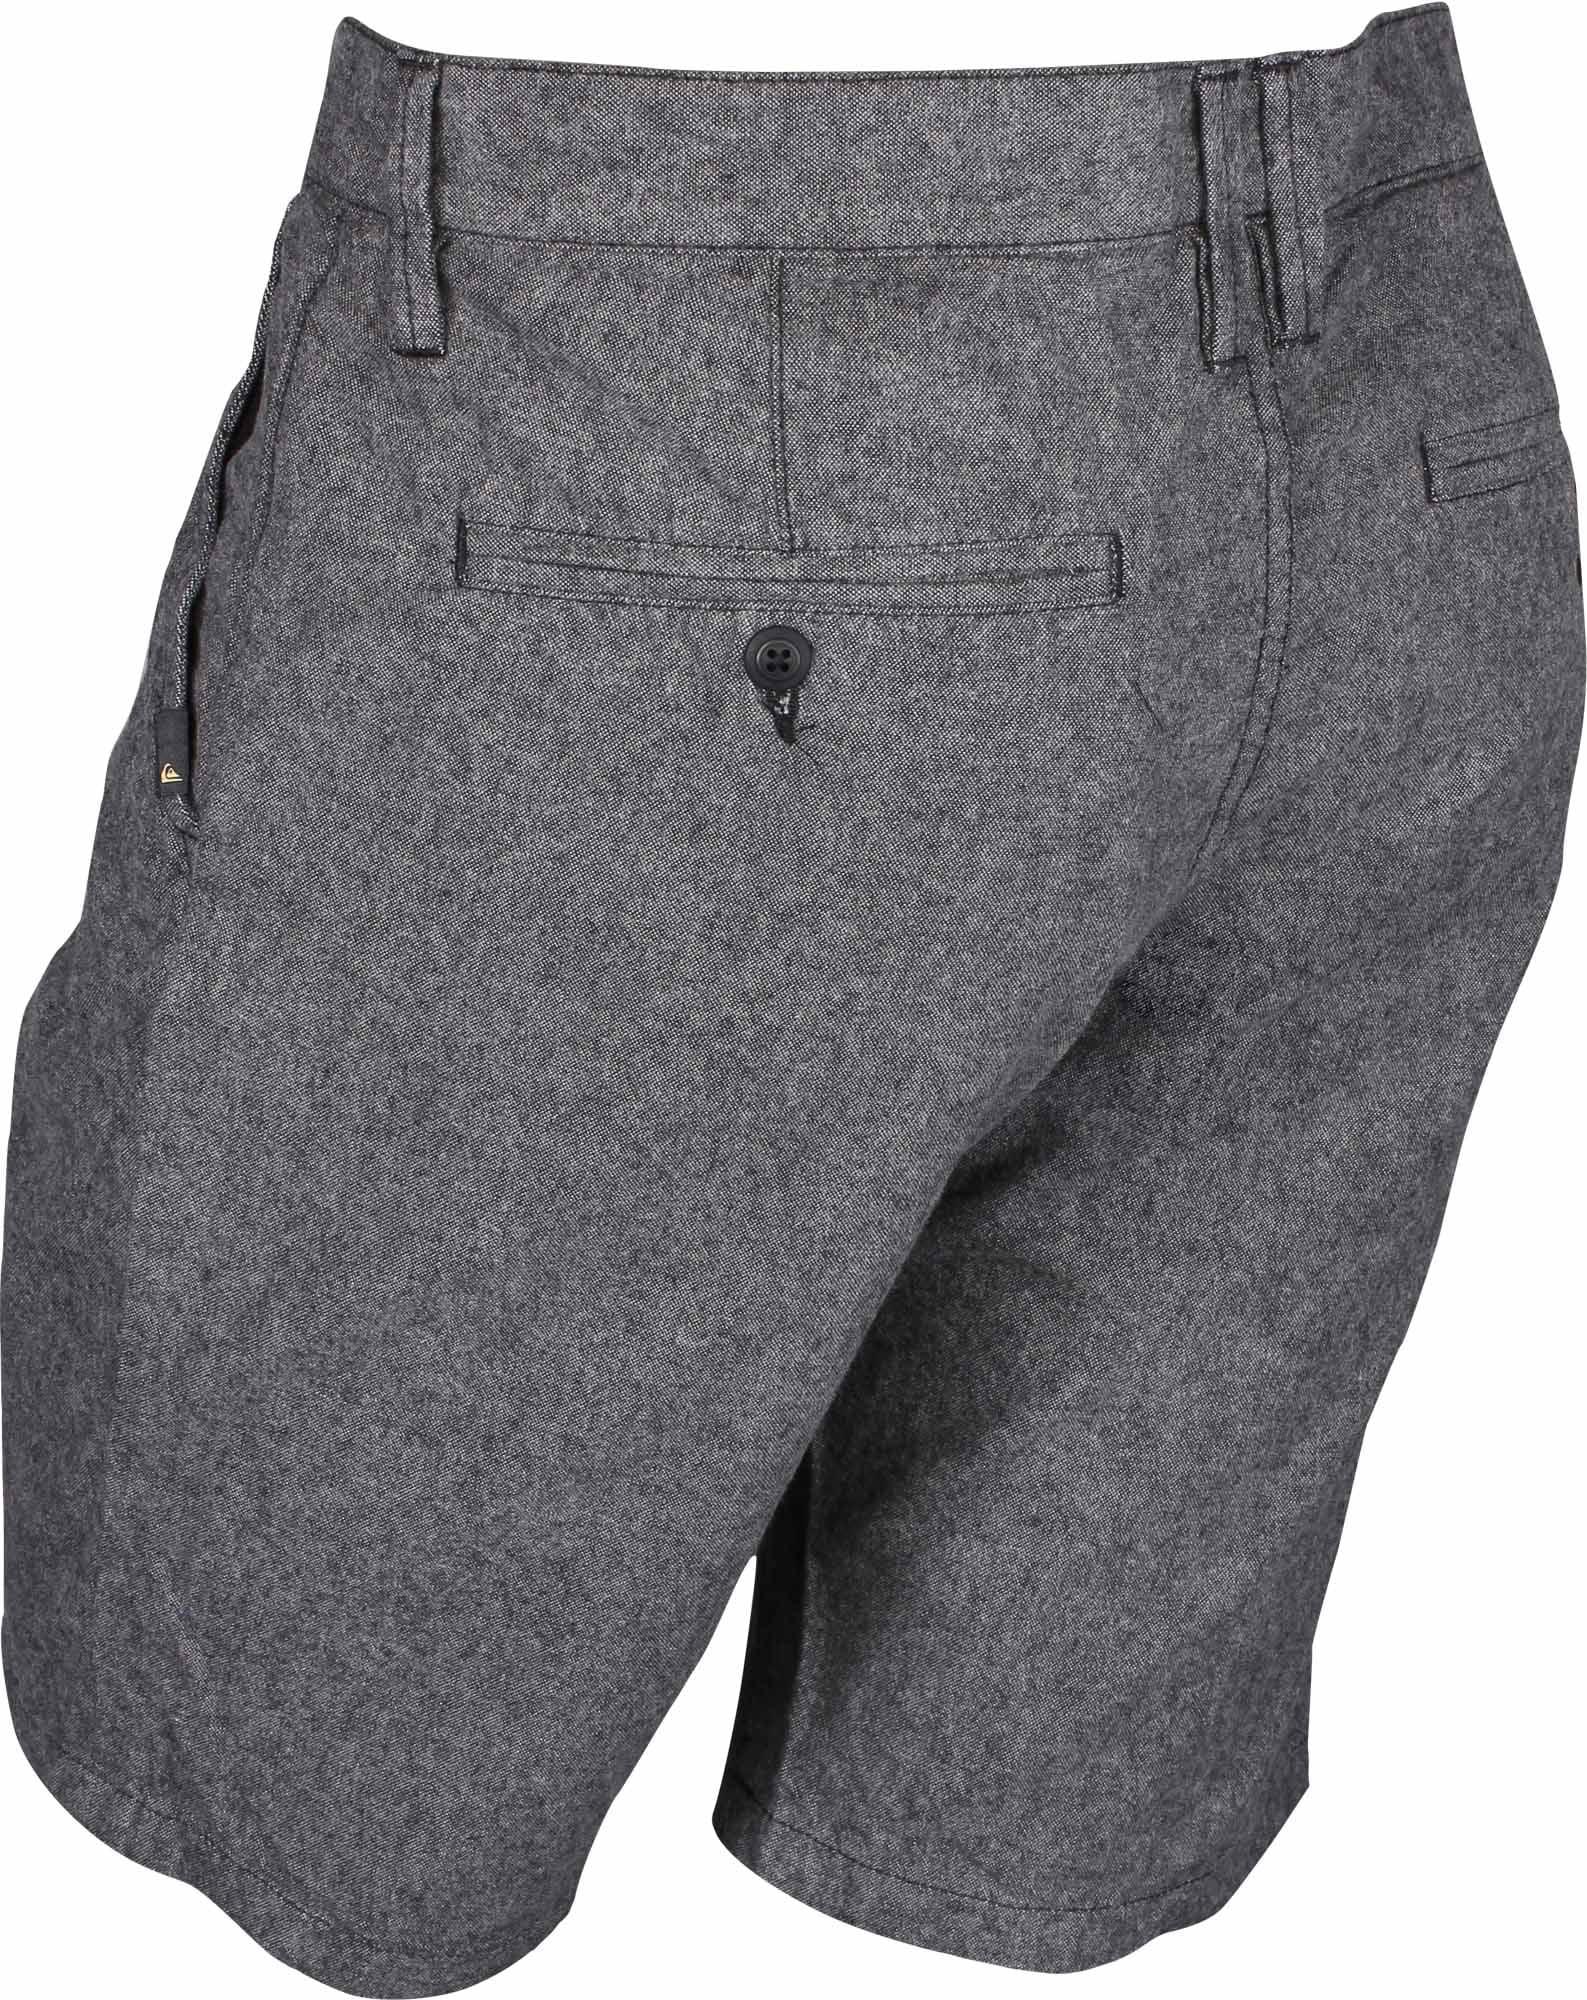 "Quiksilver Mens Krandy Oxford 20/"" Shorts Tarmac Gray"